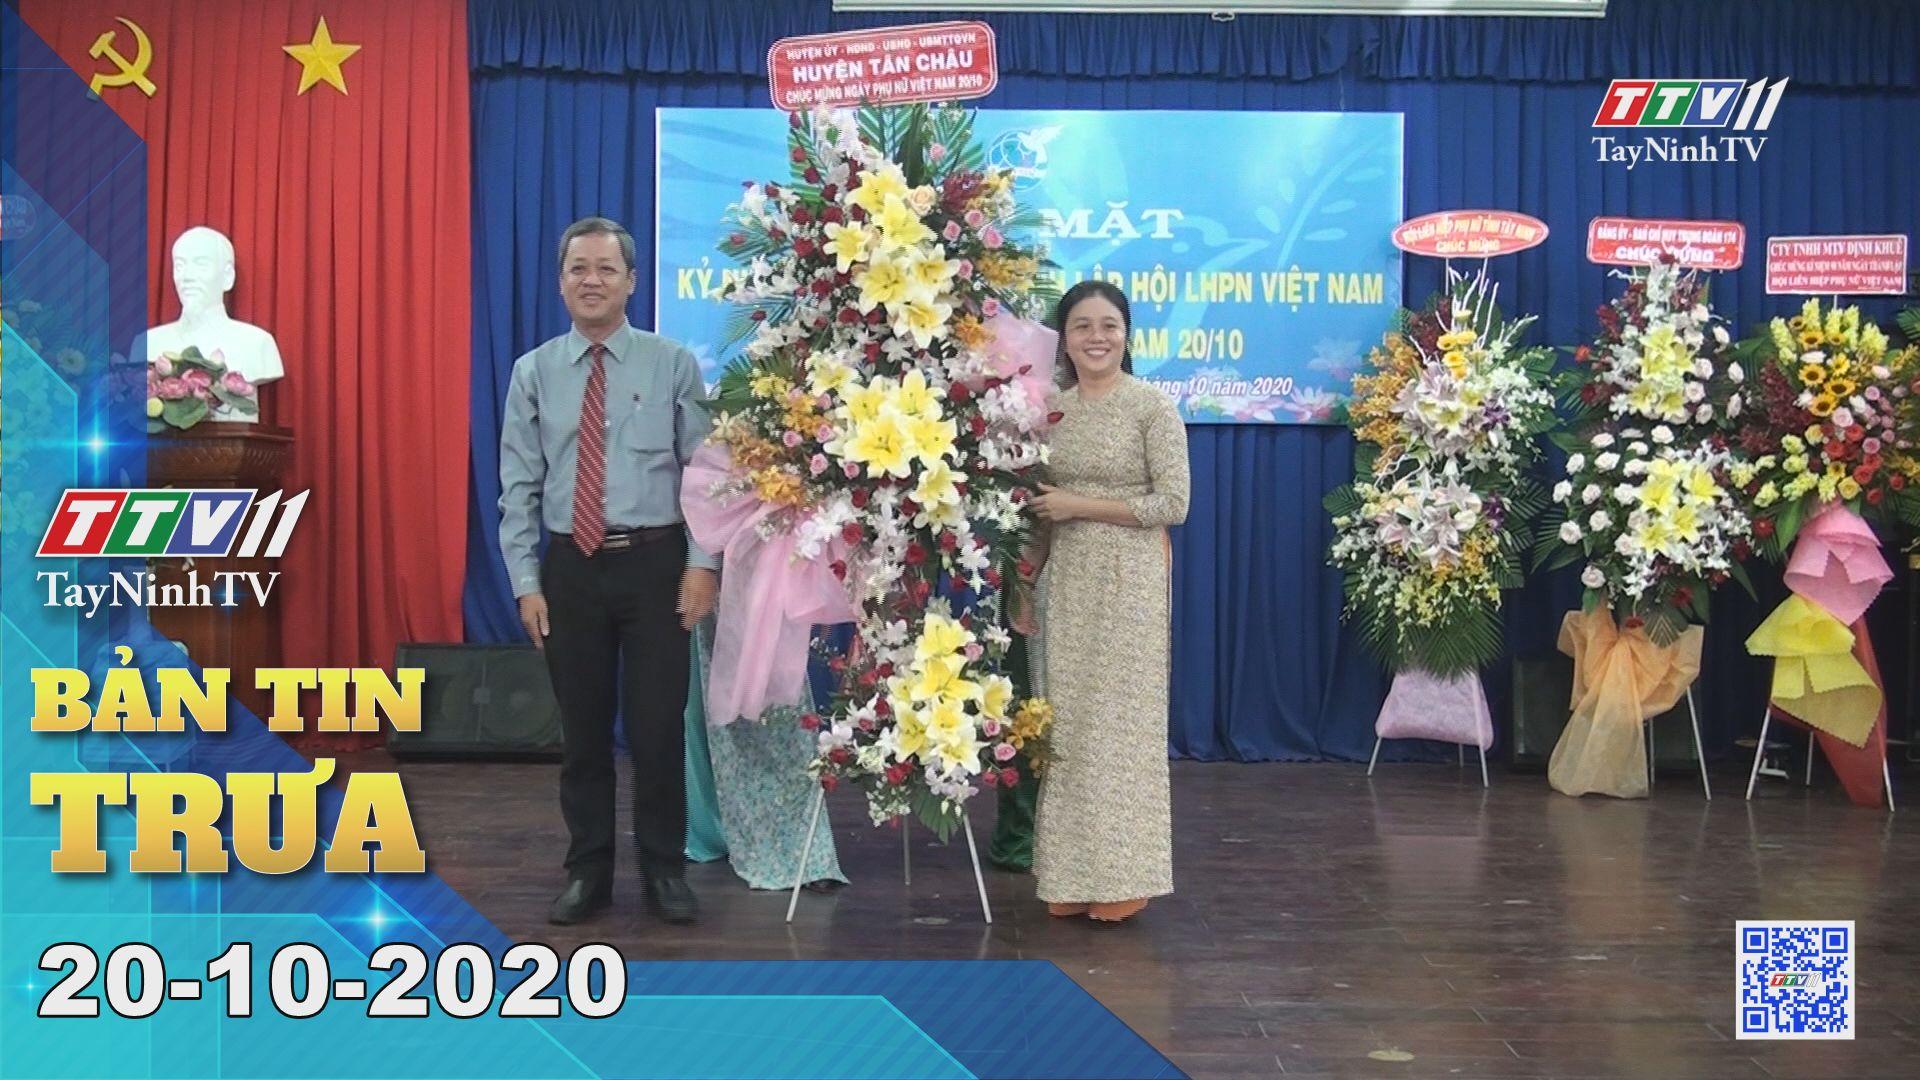 Bản tin trưa 20-10-2020 | Tin tức hôm nay | TayNinhTV